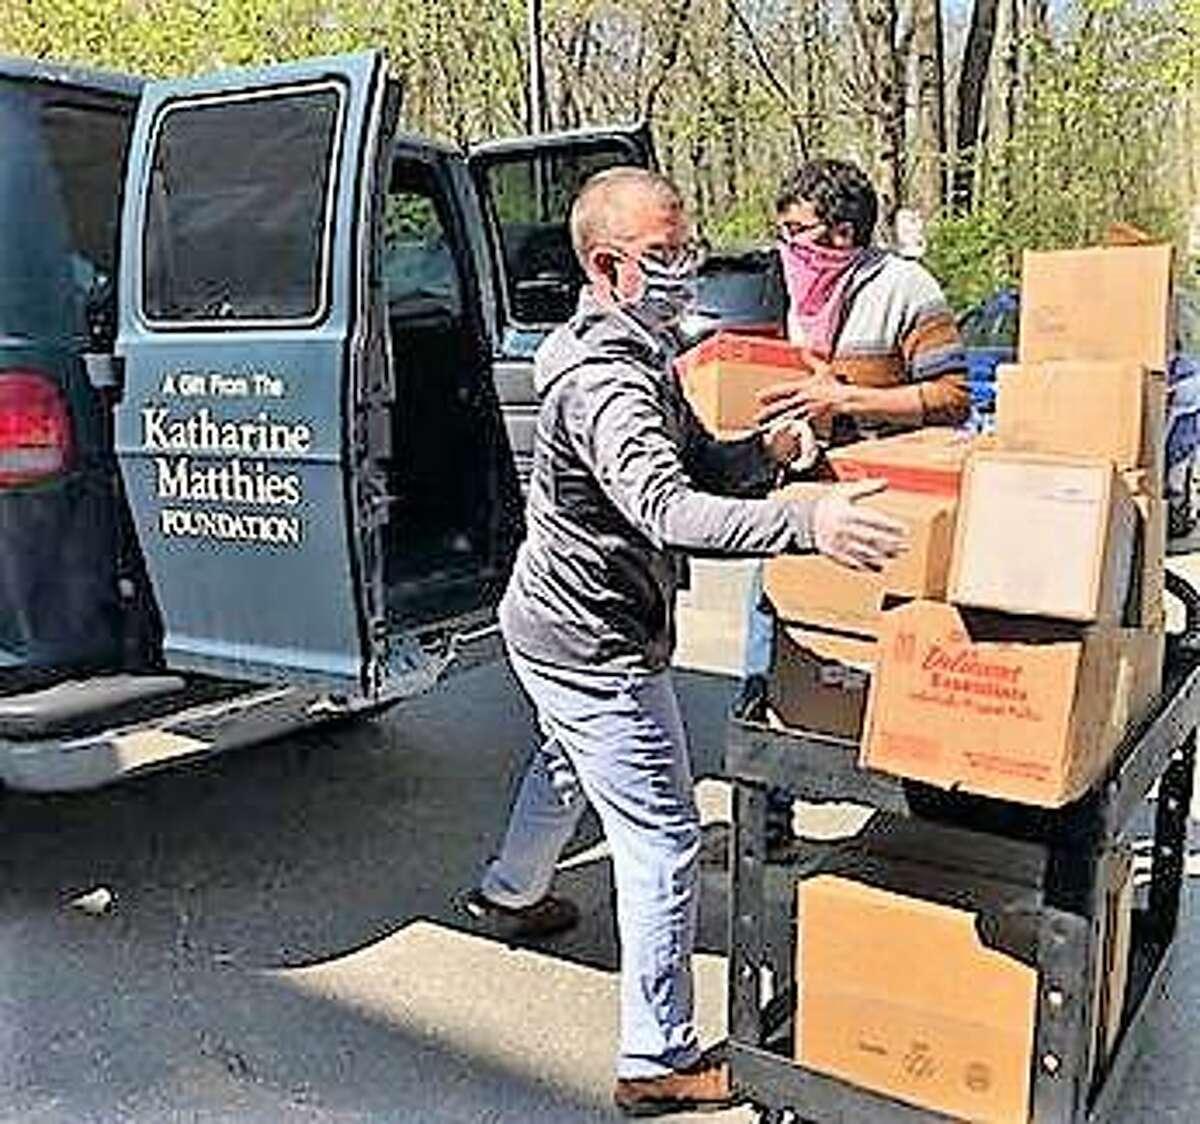 TEAM President/CEO David Morgan, left, loads frozen food into a van.